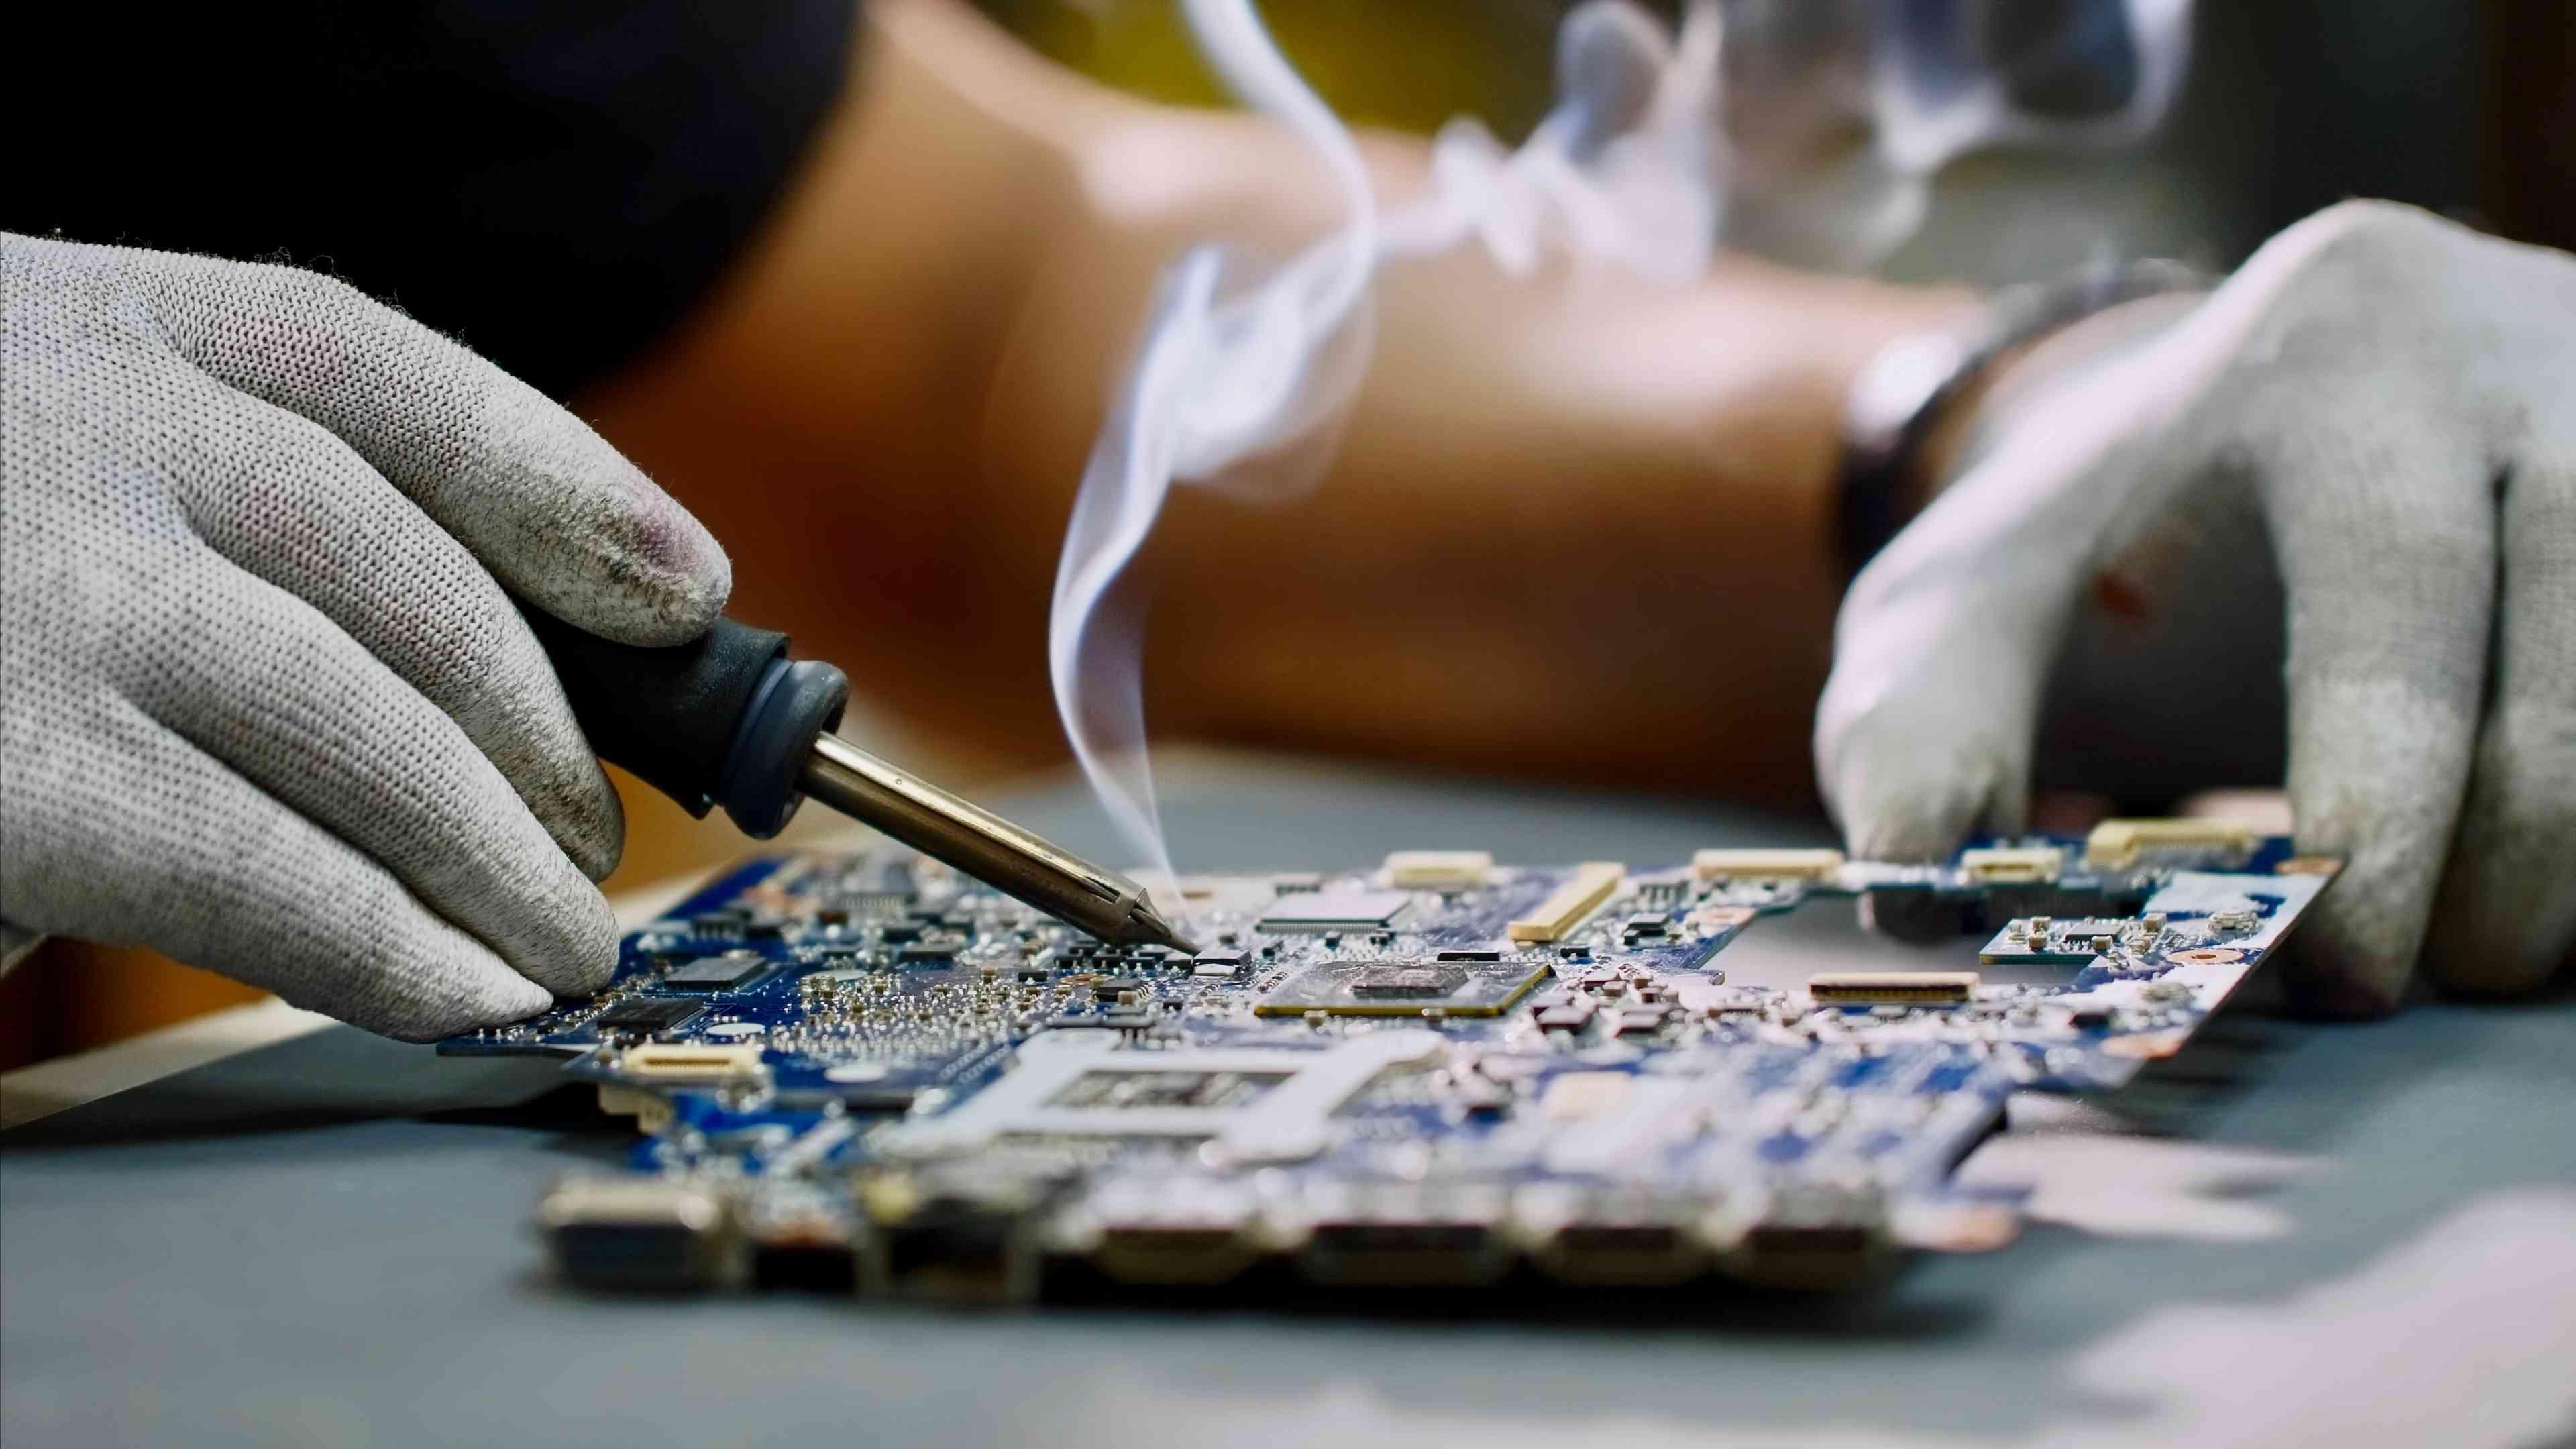 Soldering a printed circuit board